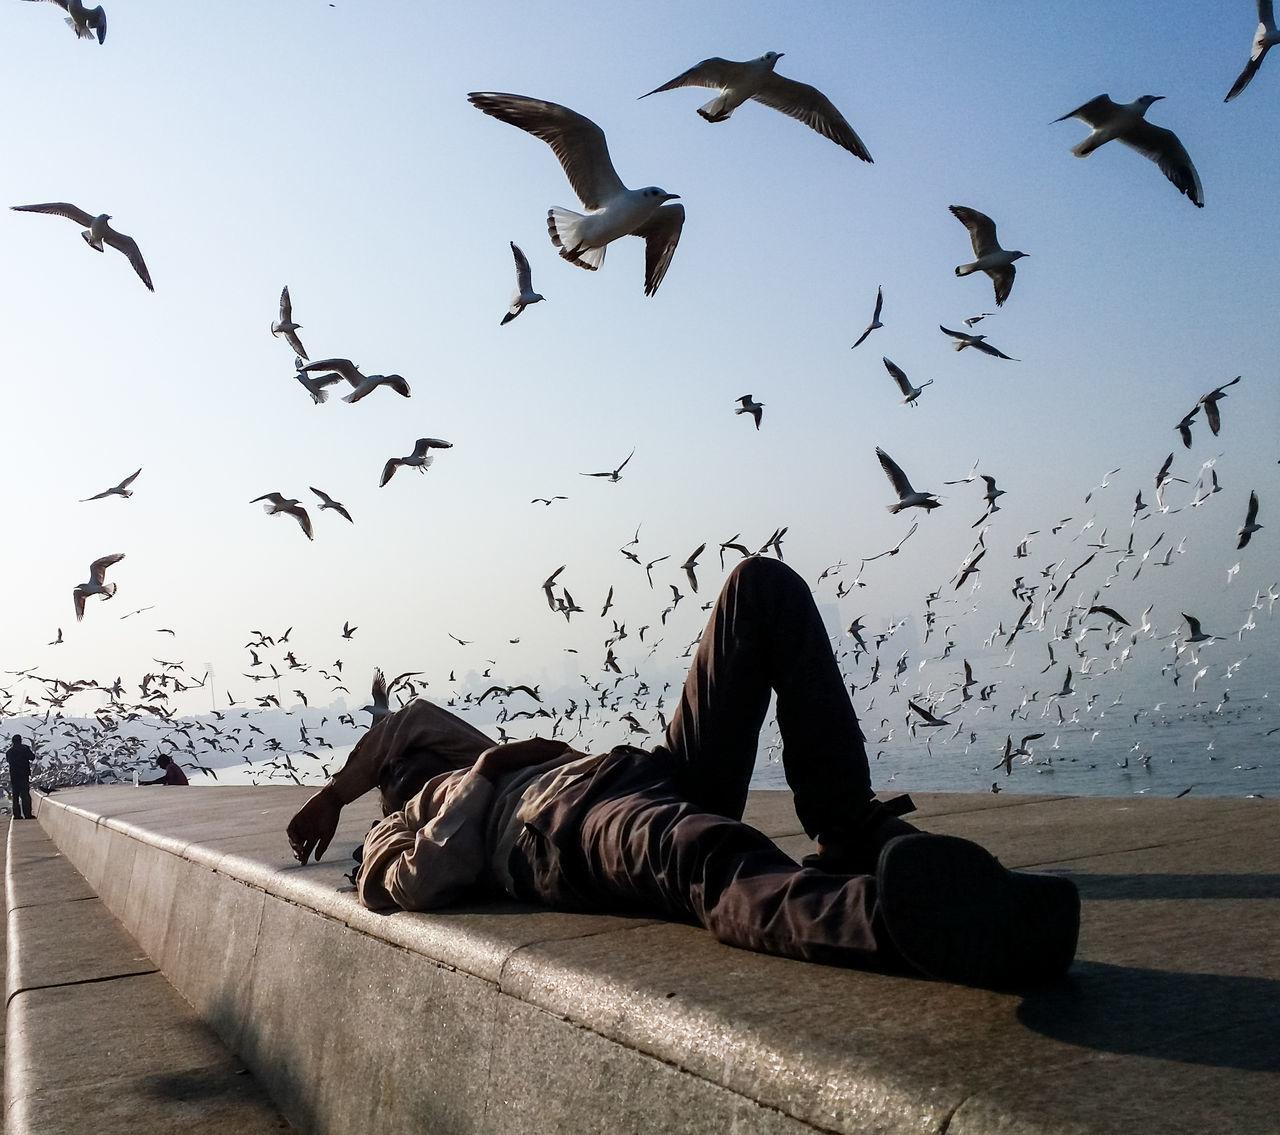 FLOCK OF BIRDS AGAINST SKY